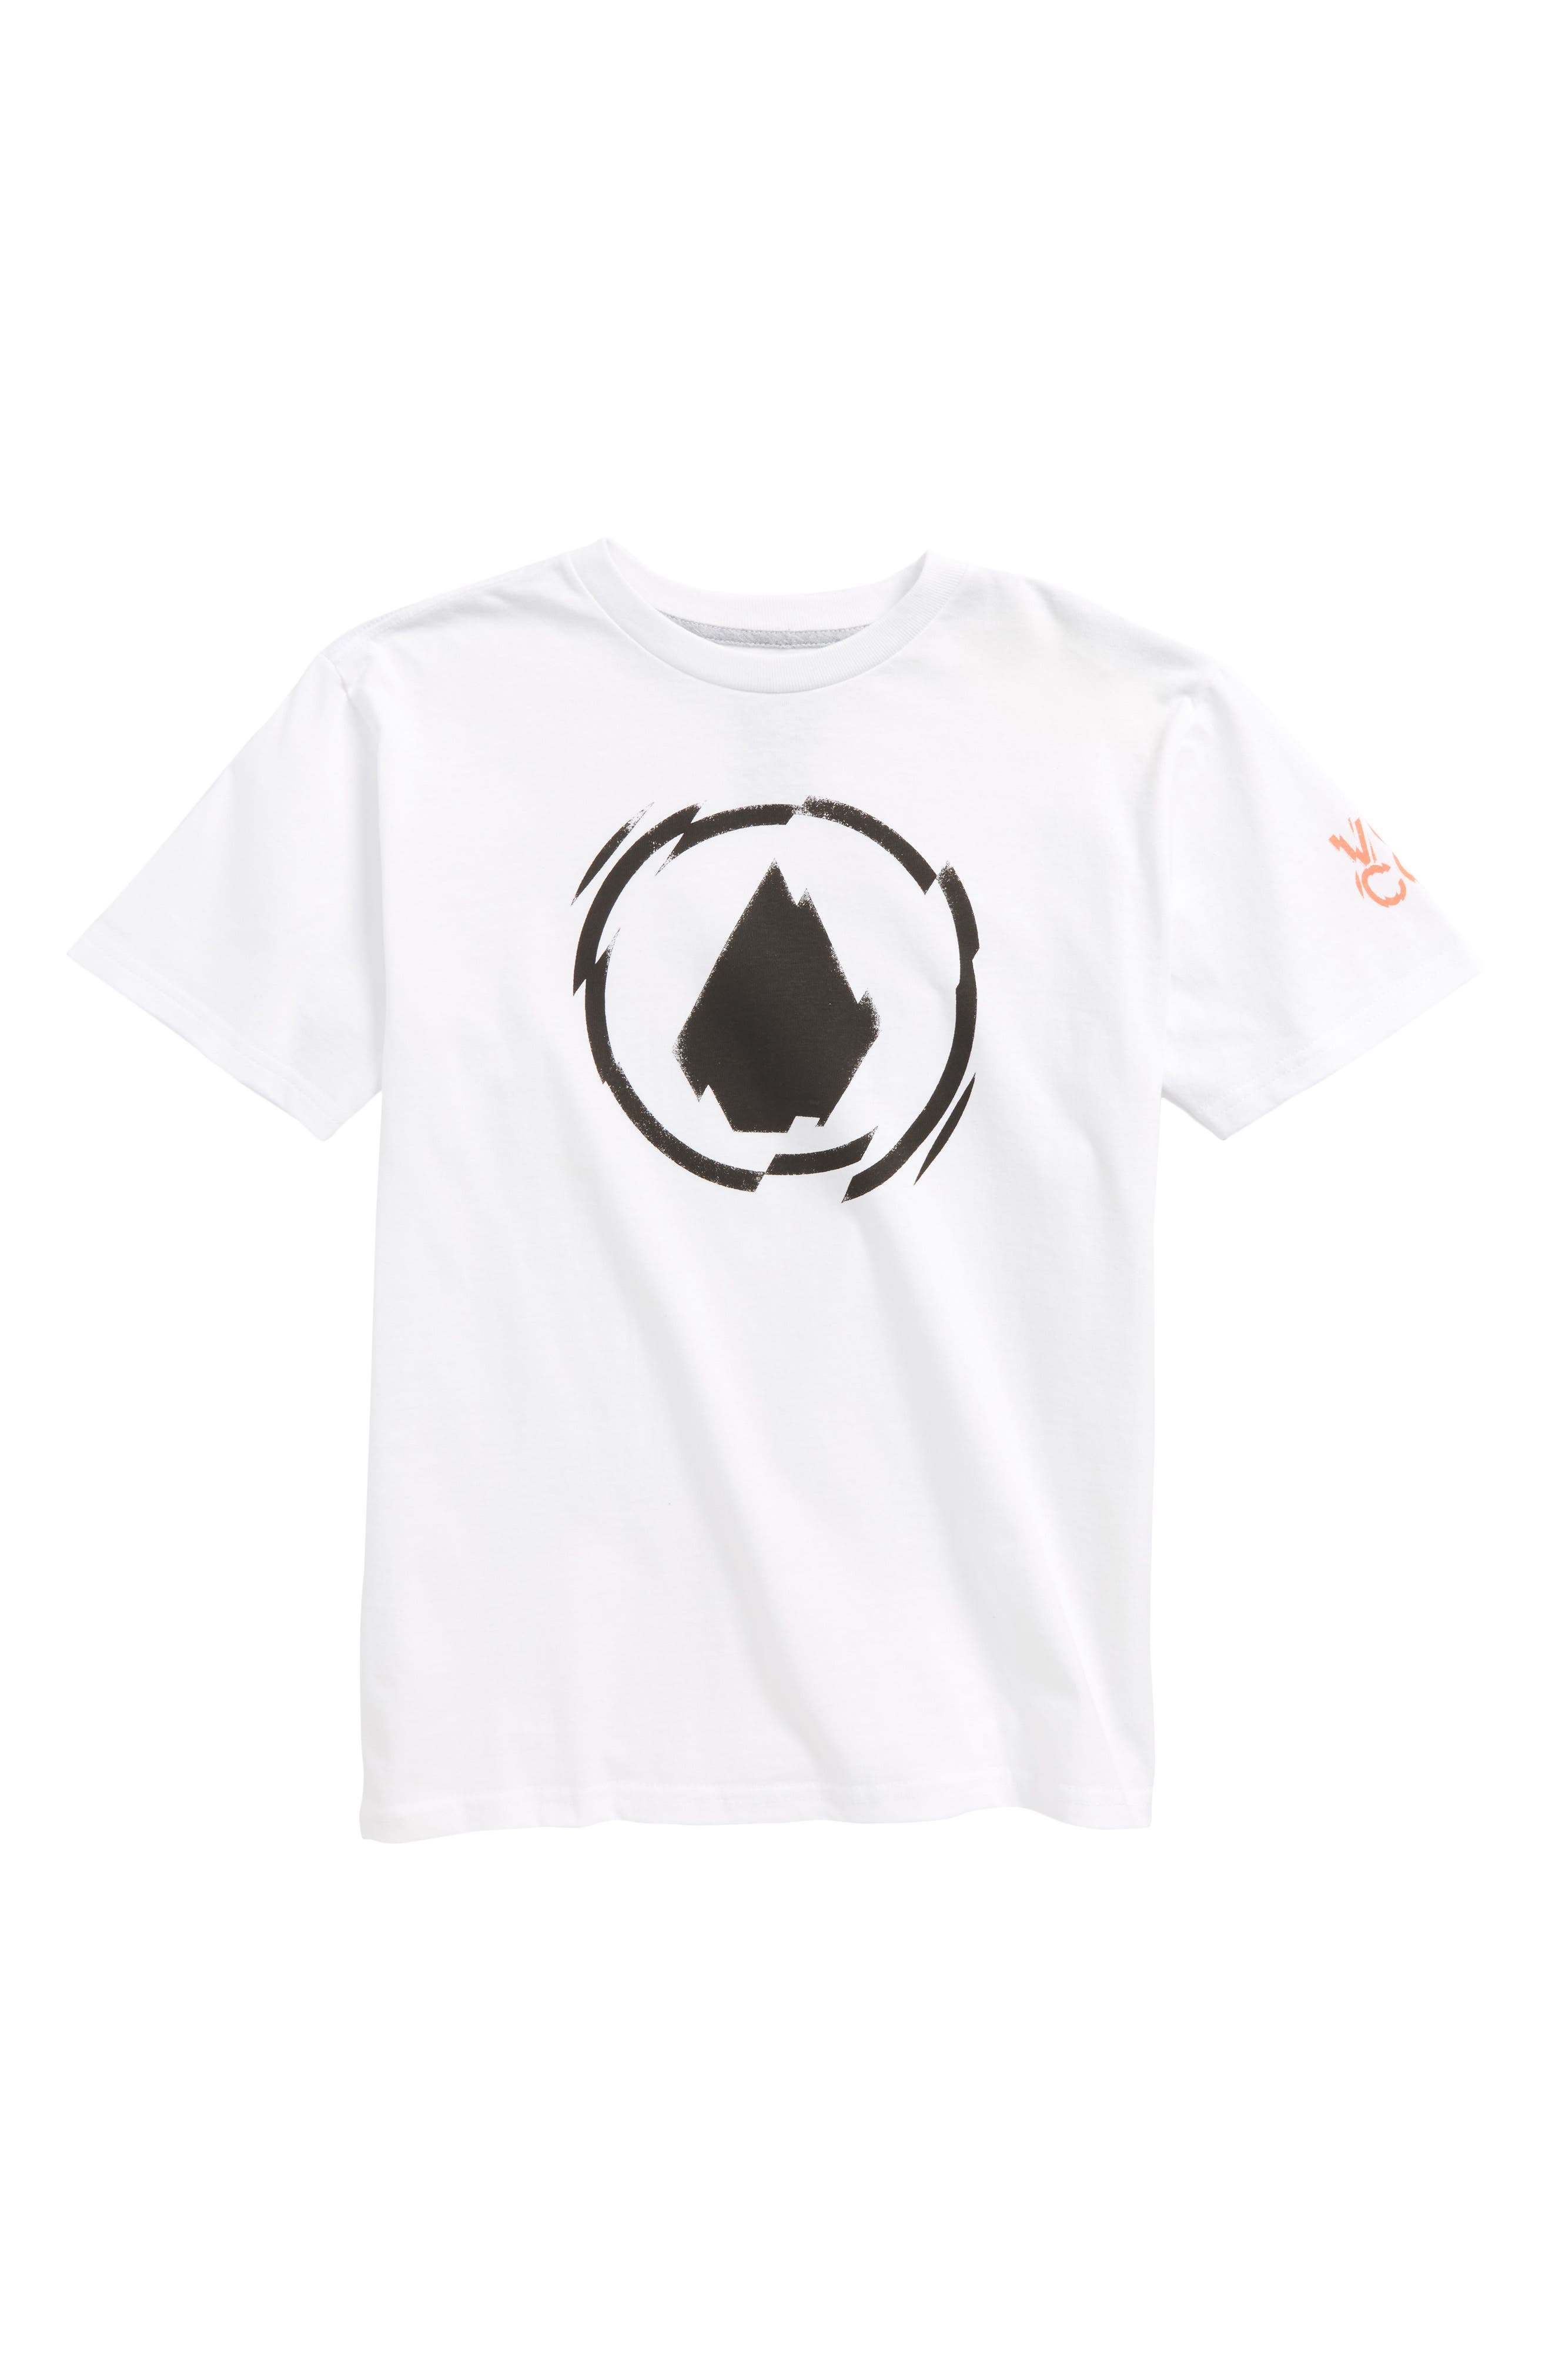 Shatter T-Shirt,                         Main,                         color, 100